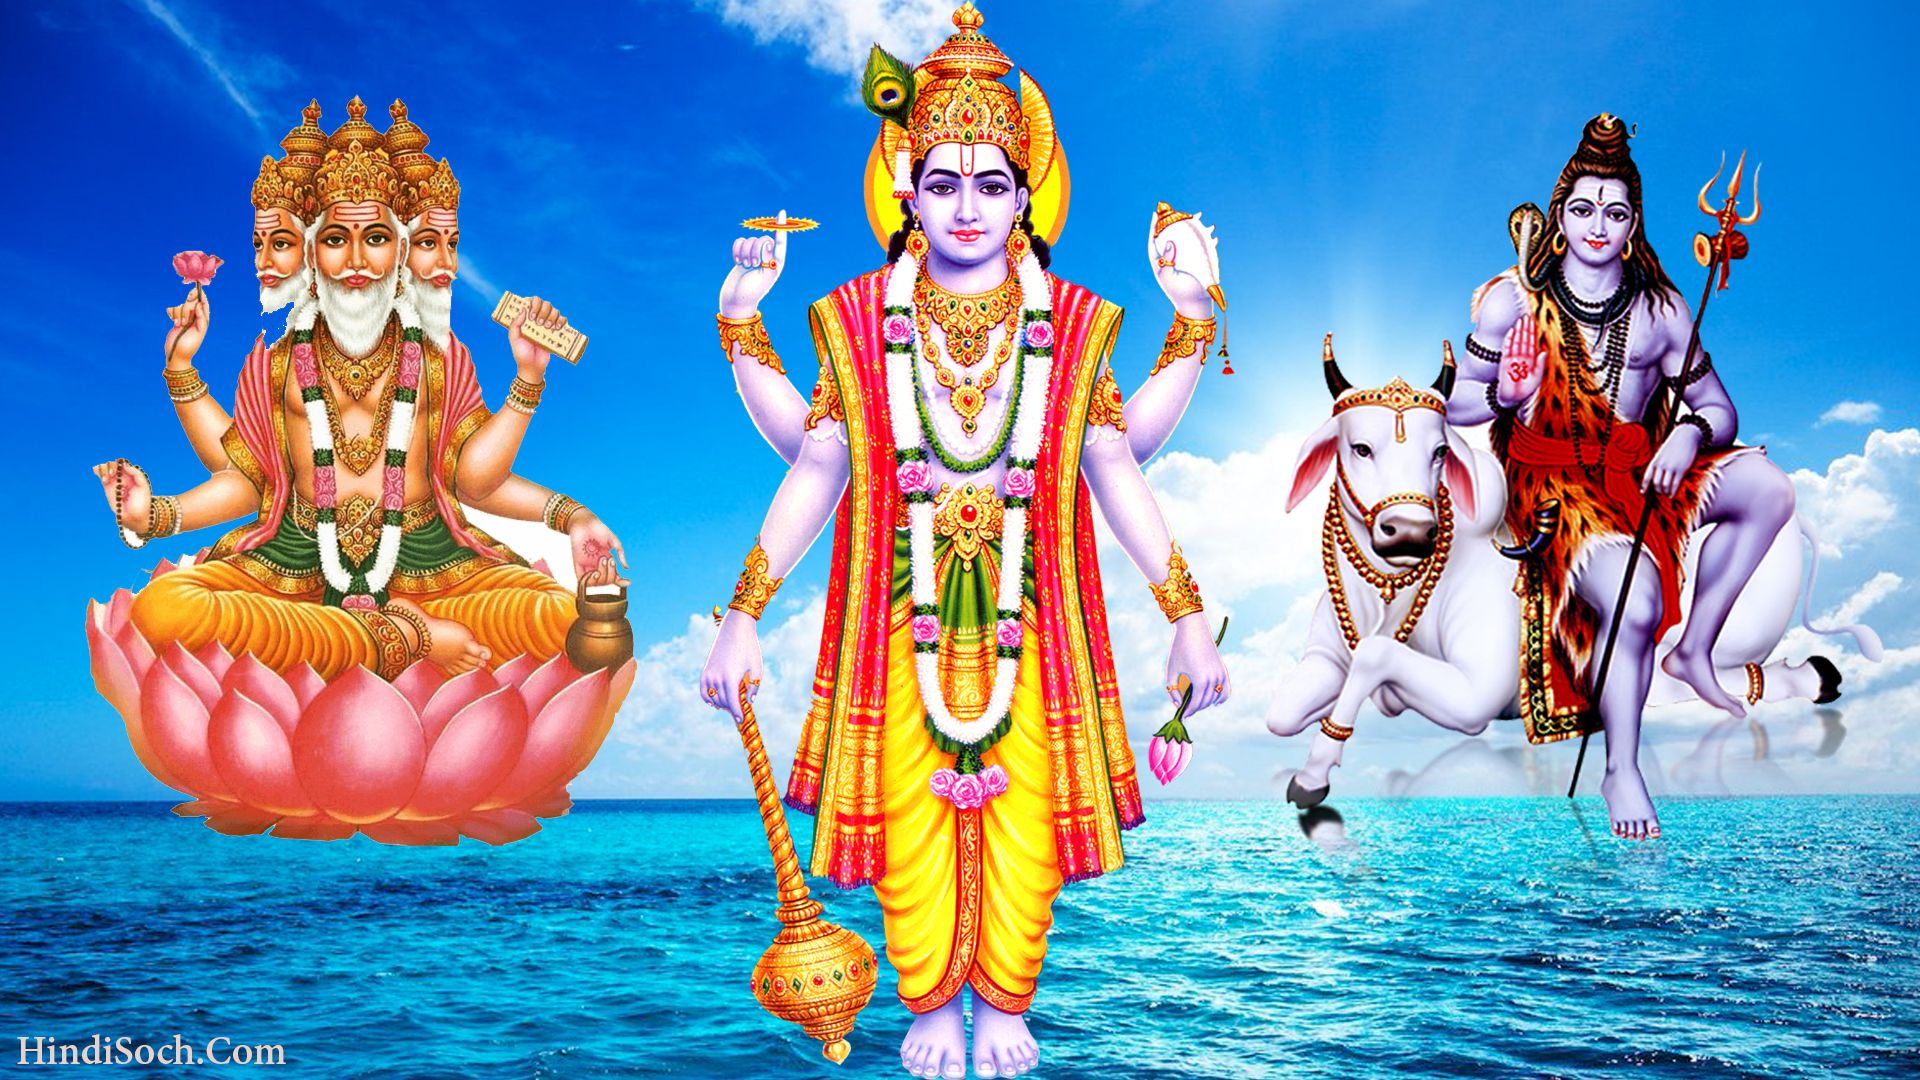 Best 3 487 Hd God Images Hindu God Wallpapers For Mobile Phones